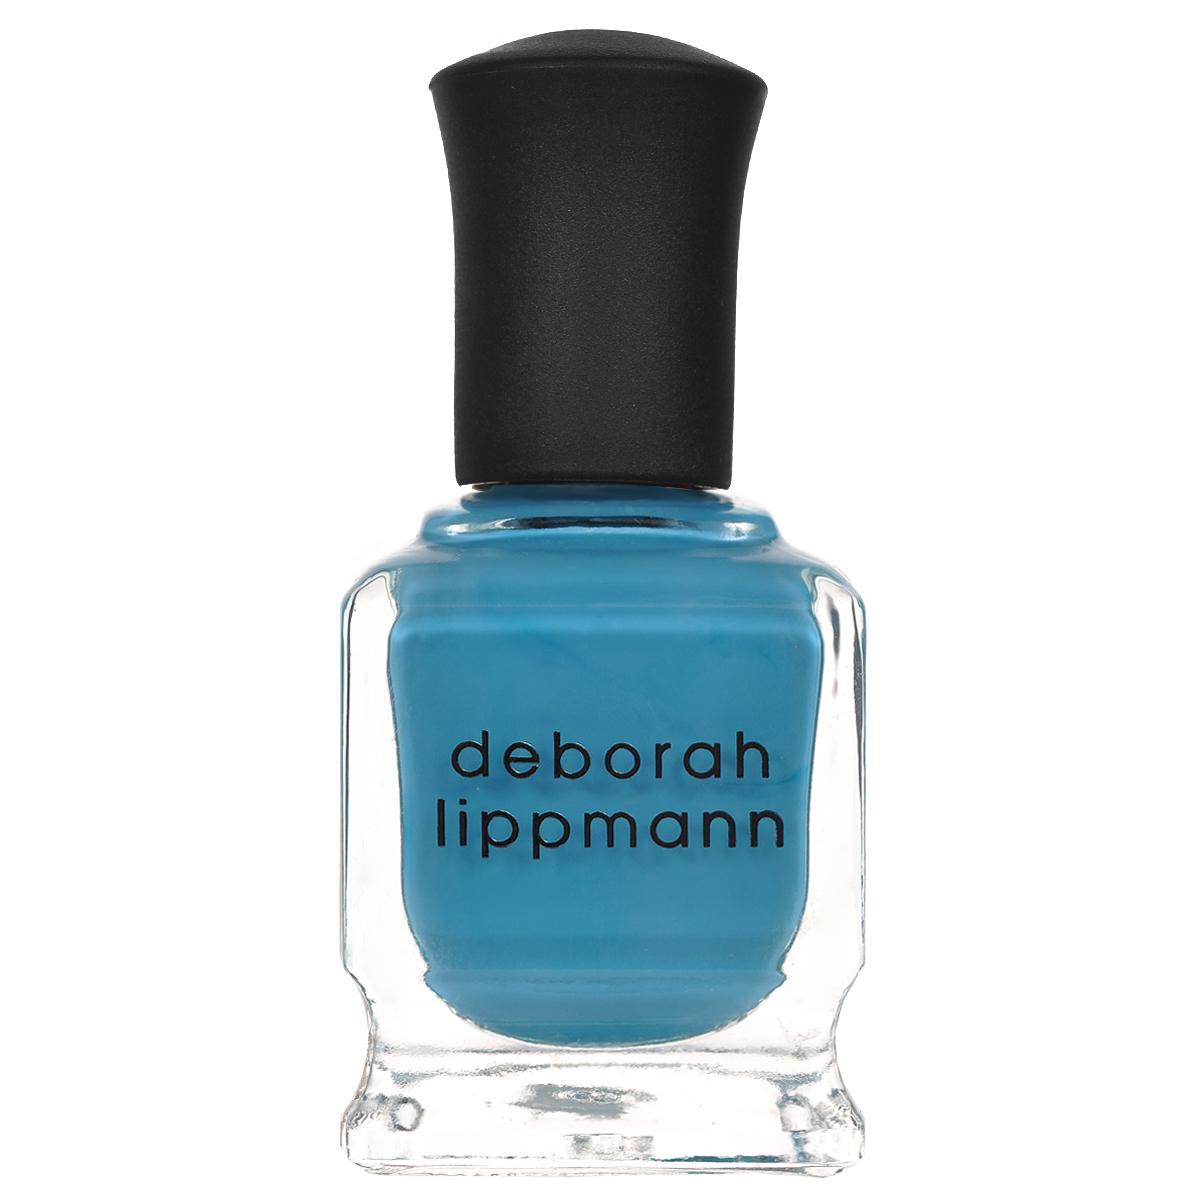 Deborah Lippmann Лак для ногтей On The Beach, 15 мл